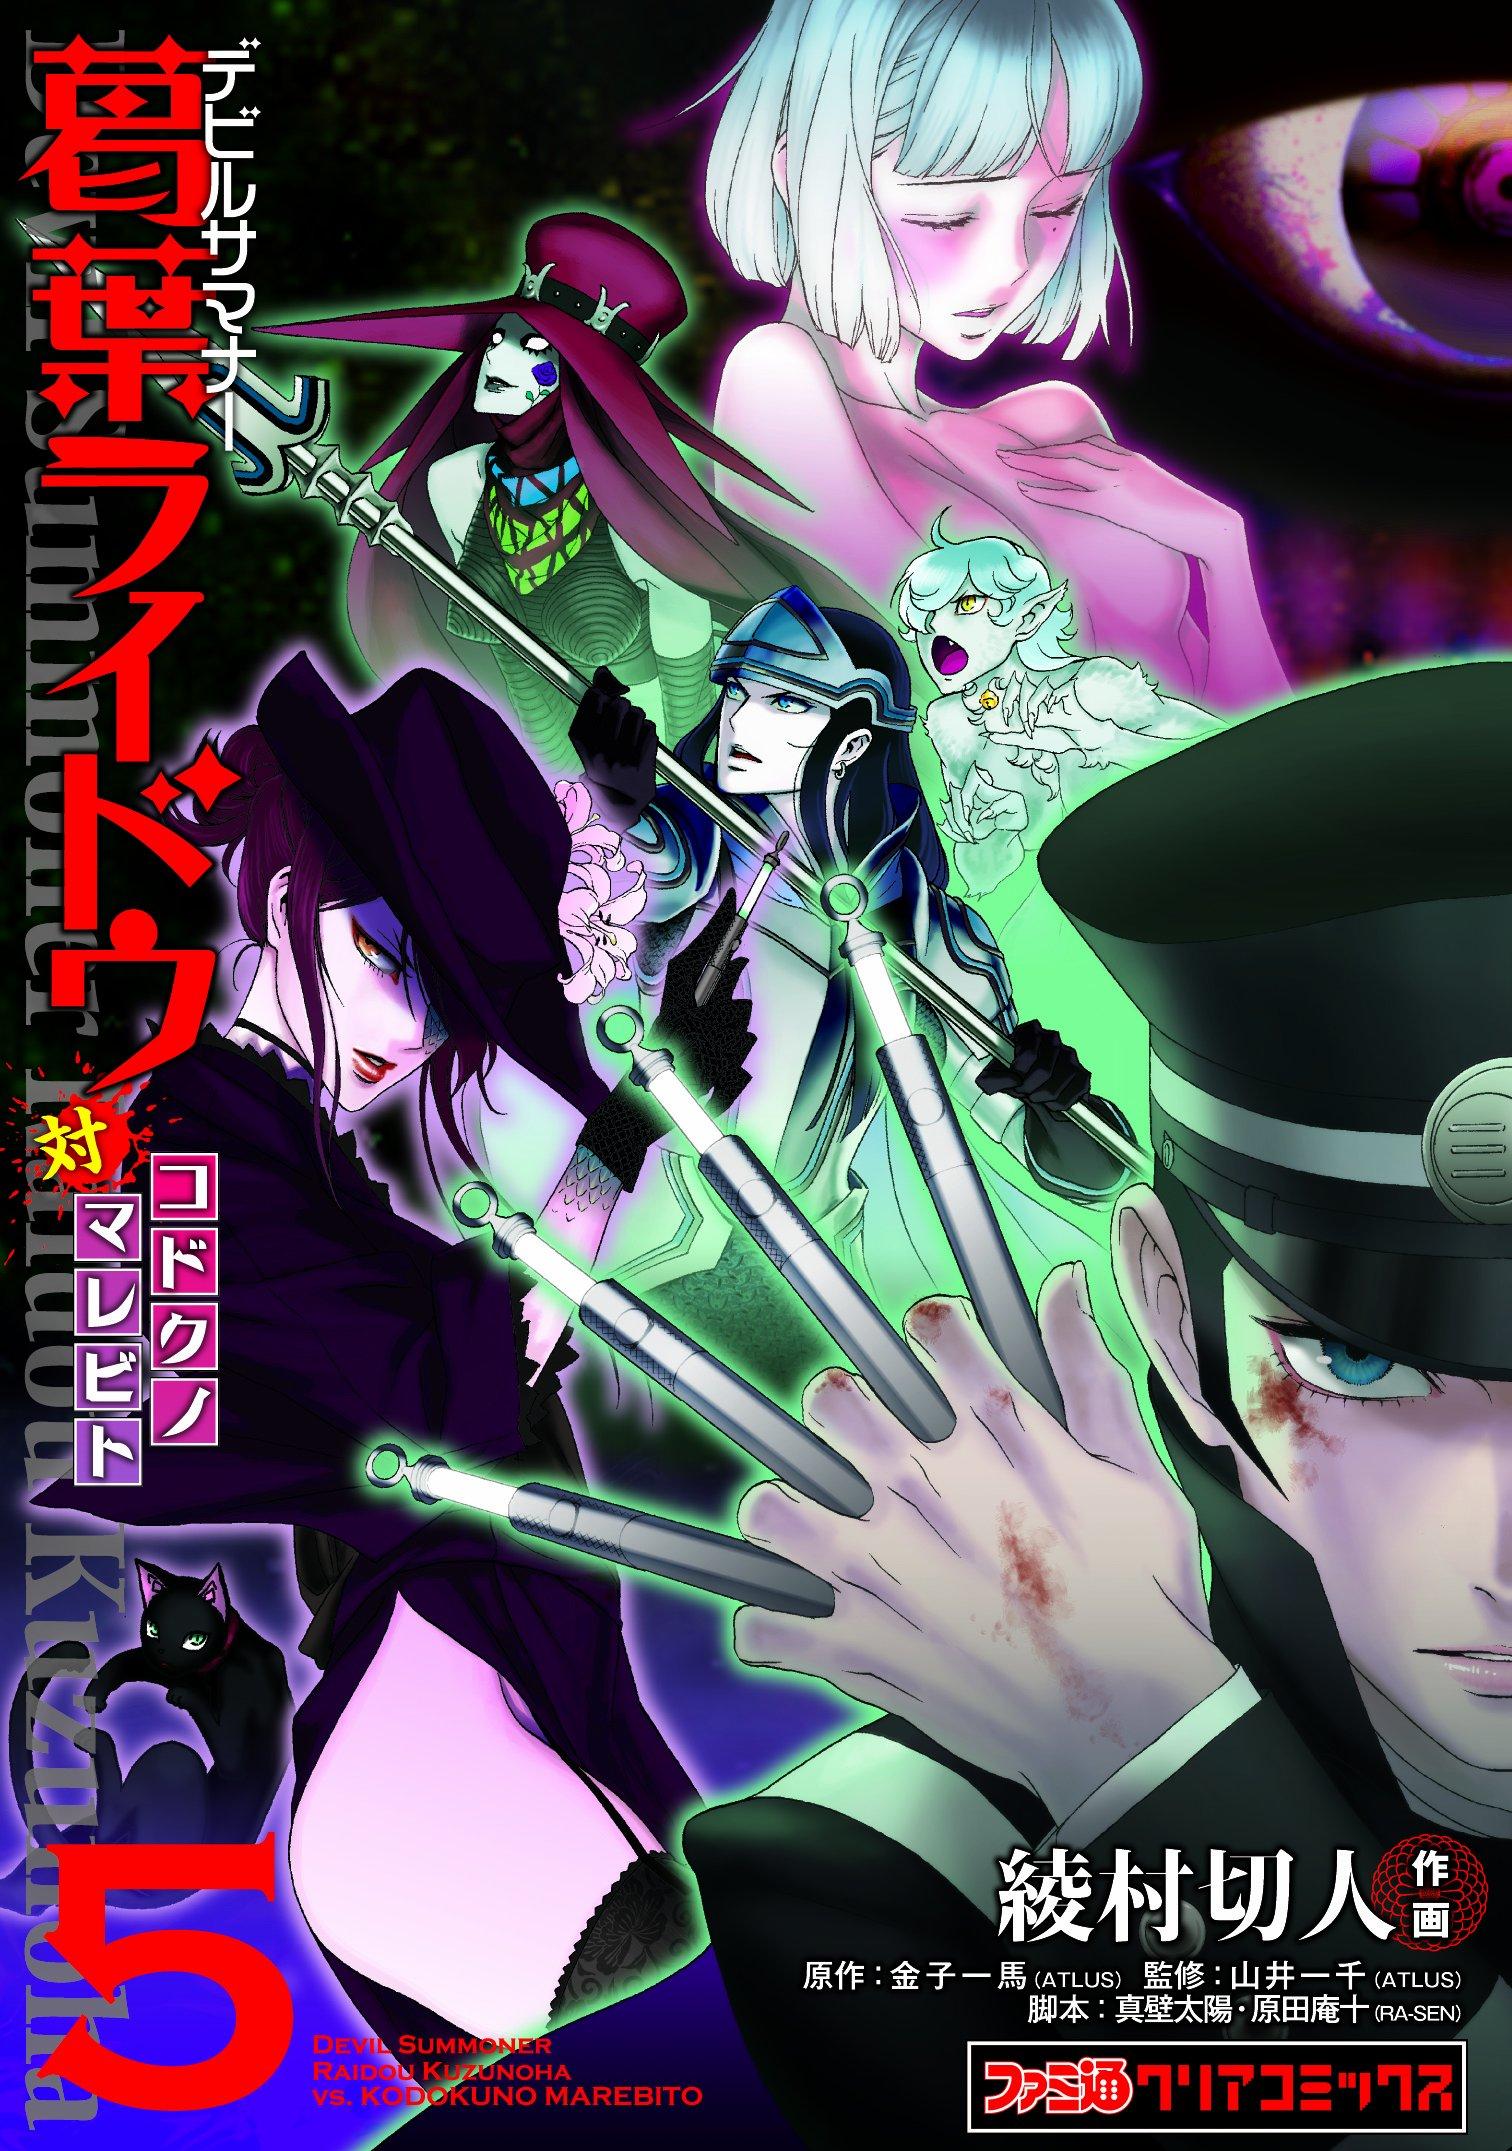 Download Devil Summoner Kuzunoha Raidou vs. Kodok Roh Marebito (5) (Famitsu Clear Comics) (2012) ISBN: 4047280488 [Japanese Import] ebook